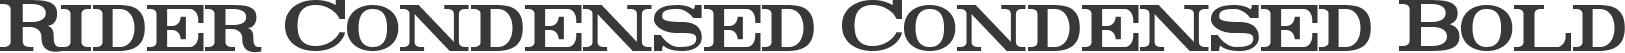 Rider Condensed Condensed Bold